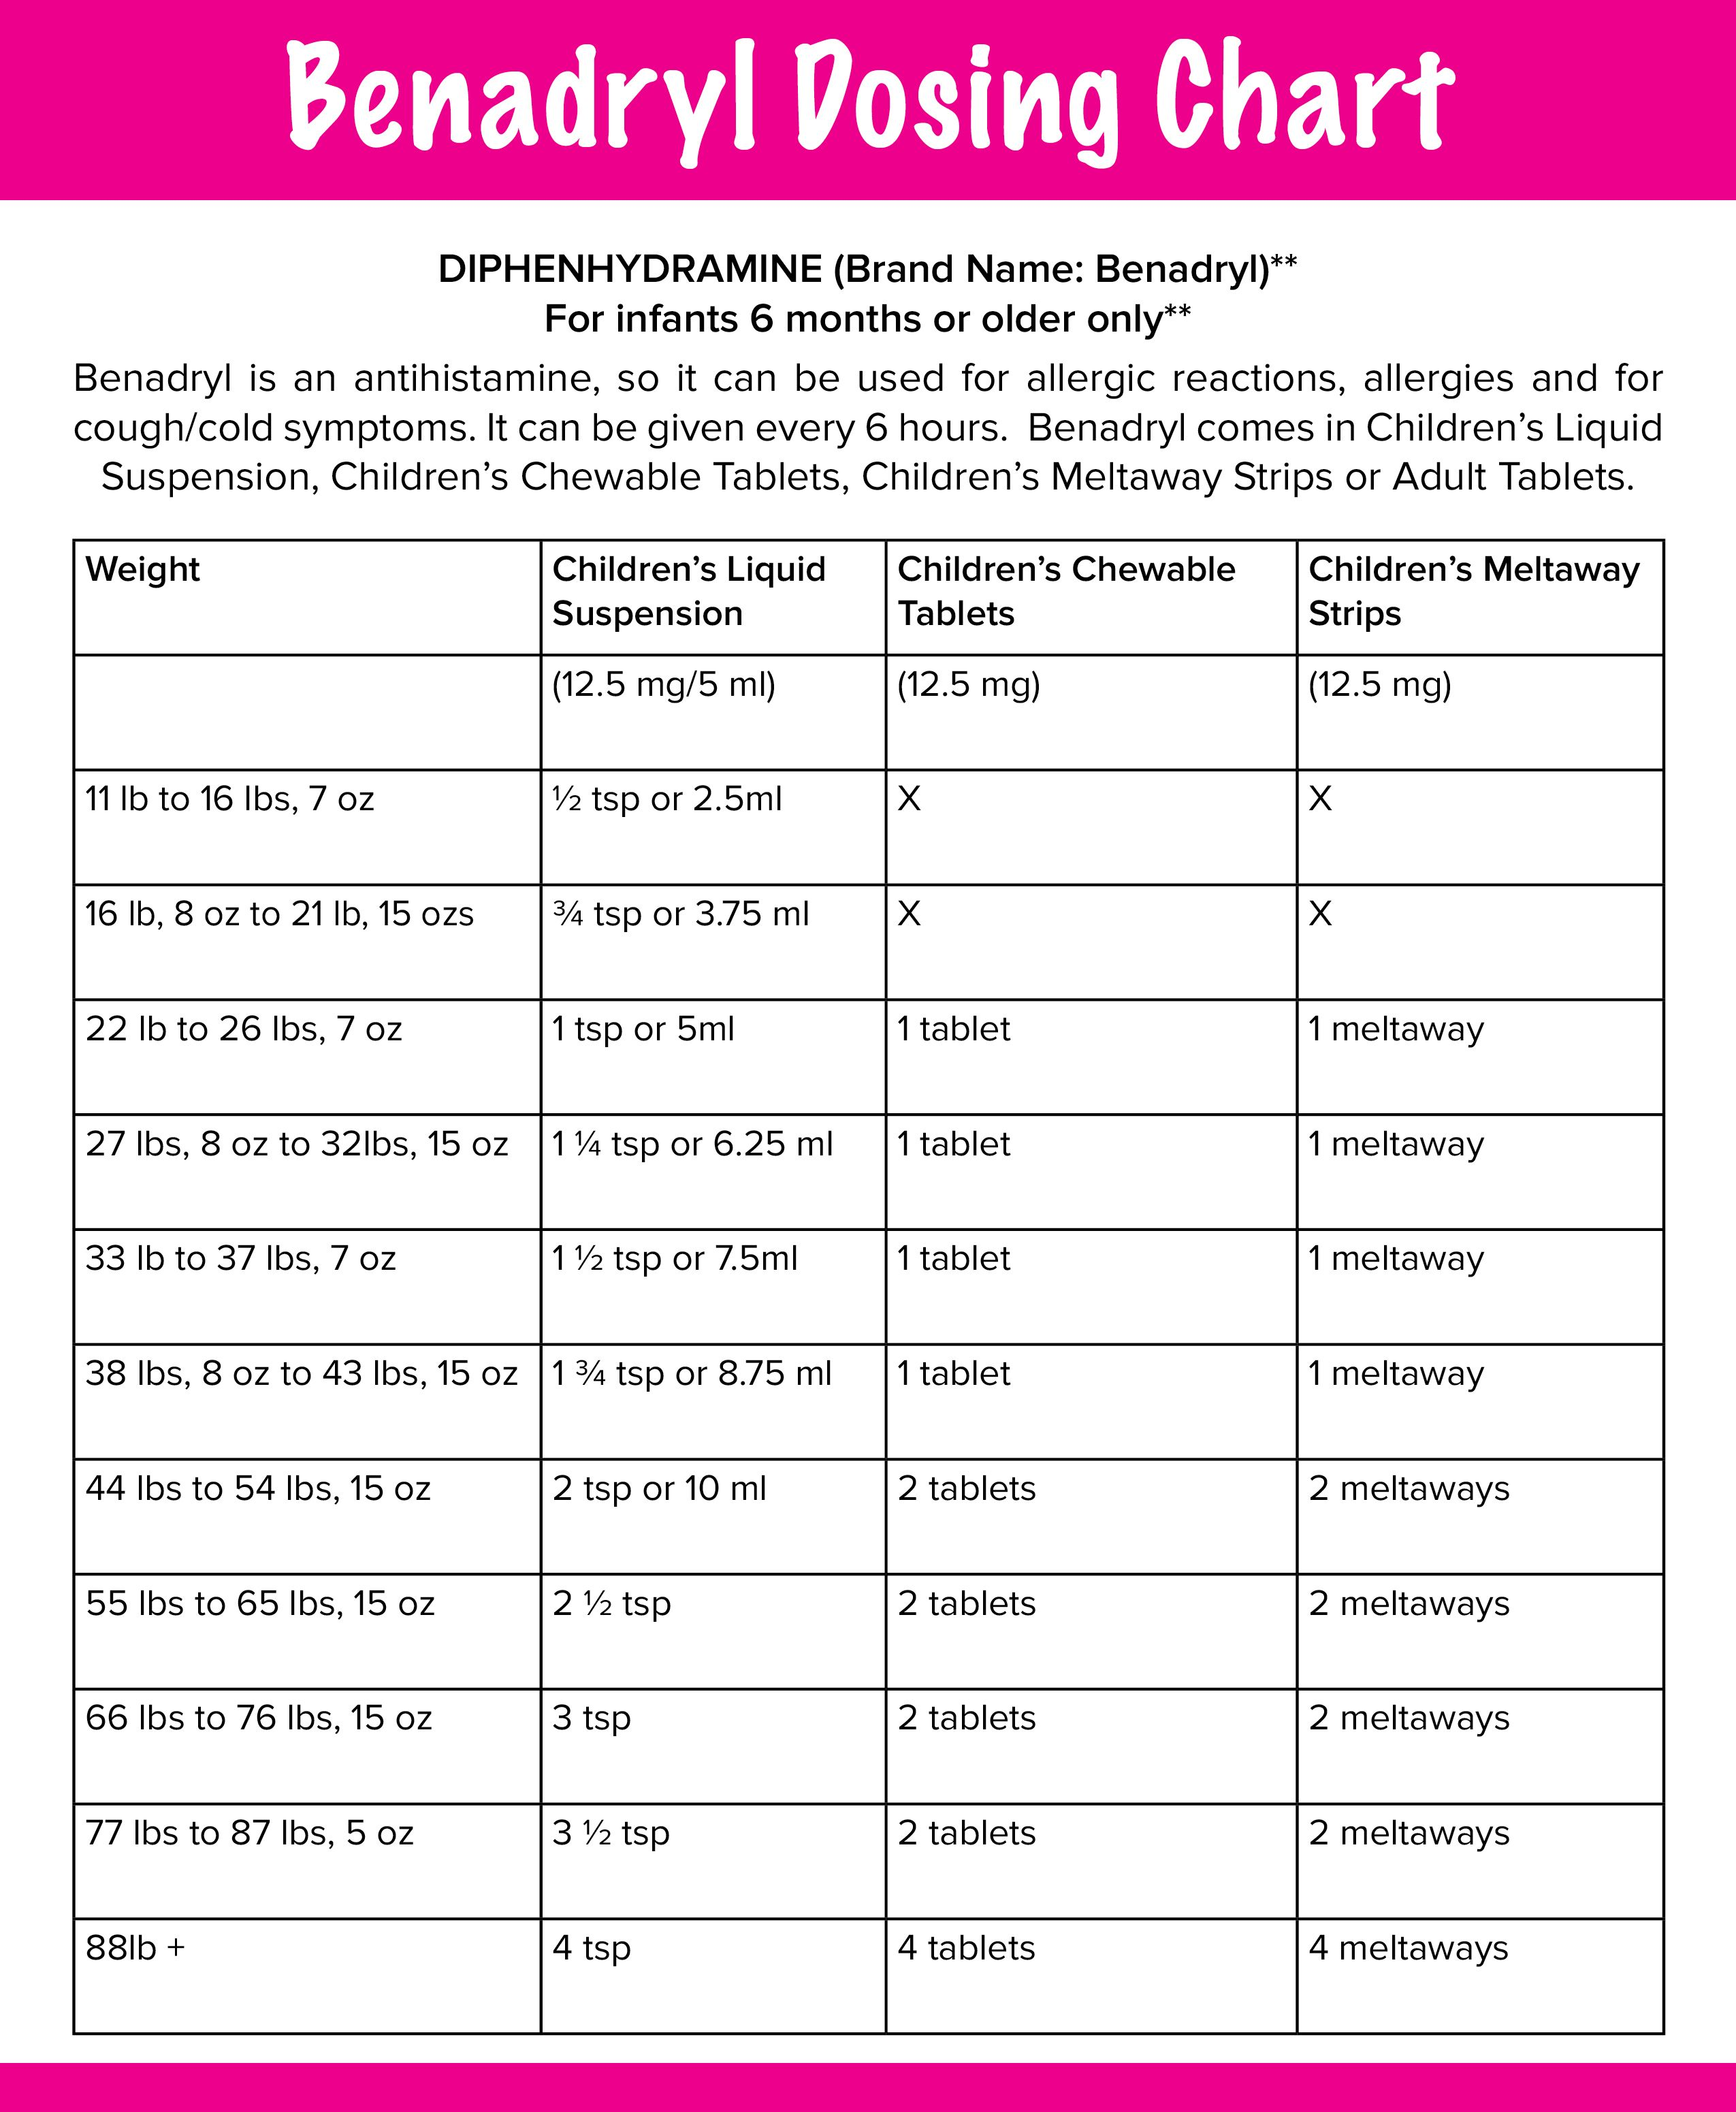 Phc Peds Benadryl Dosing Chart Jpg 2550 3102 Benadryl Dosage